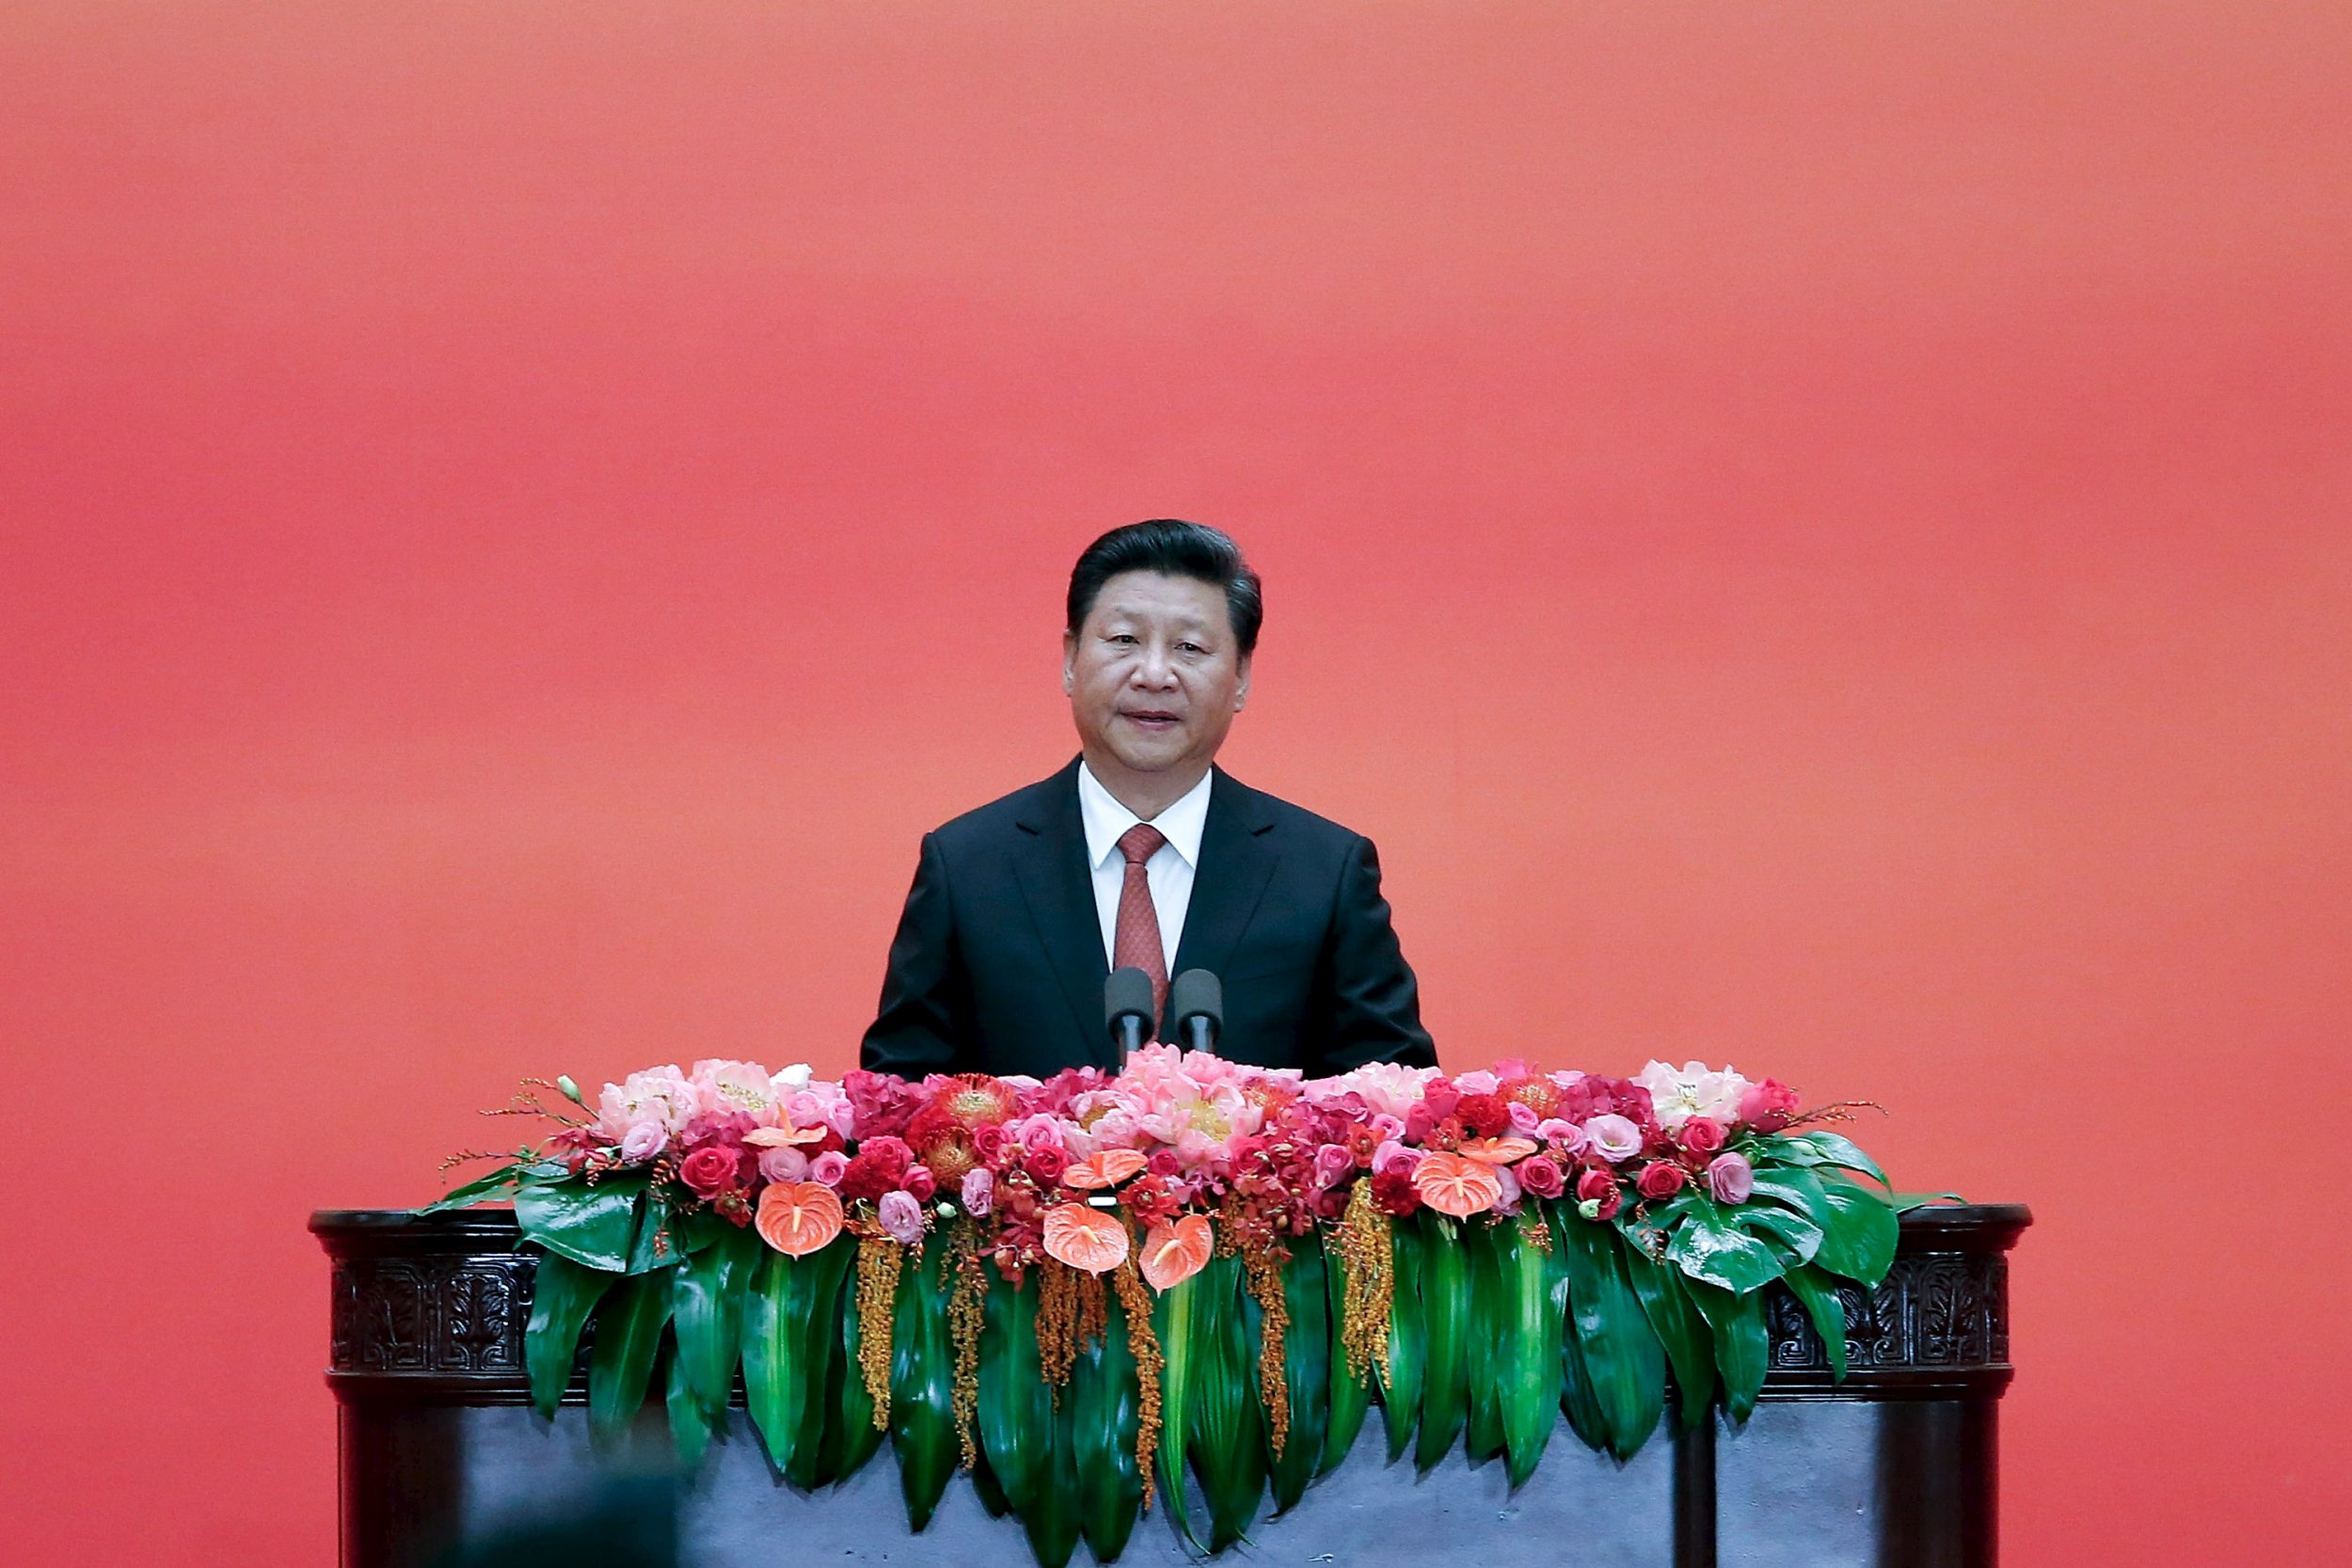 0922_Xi Jinping_China US Visit